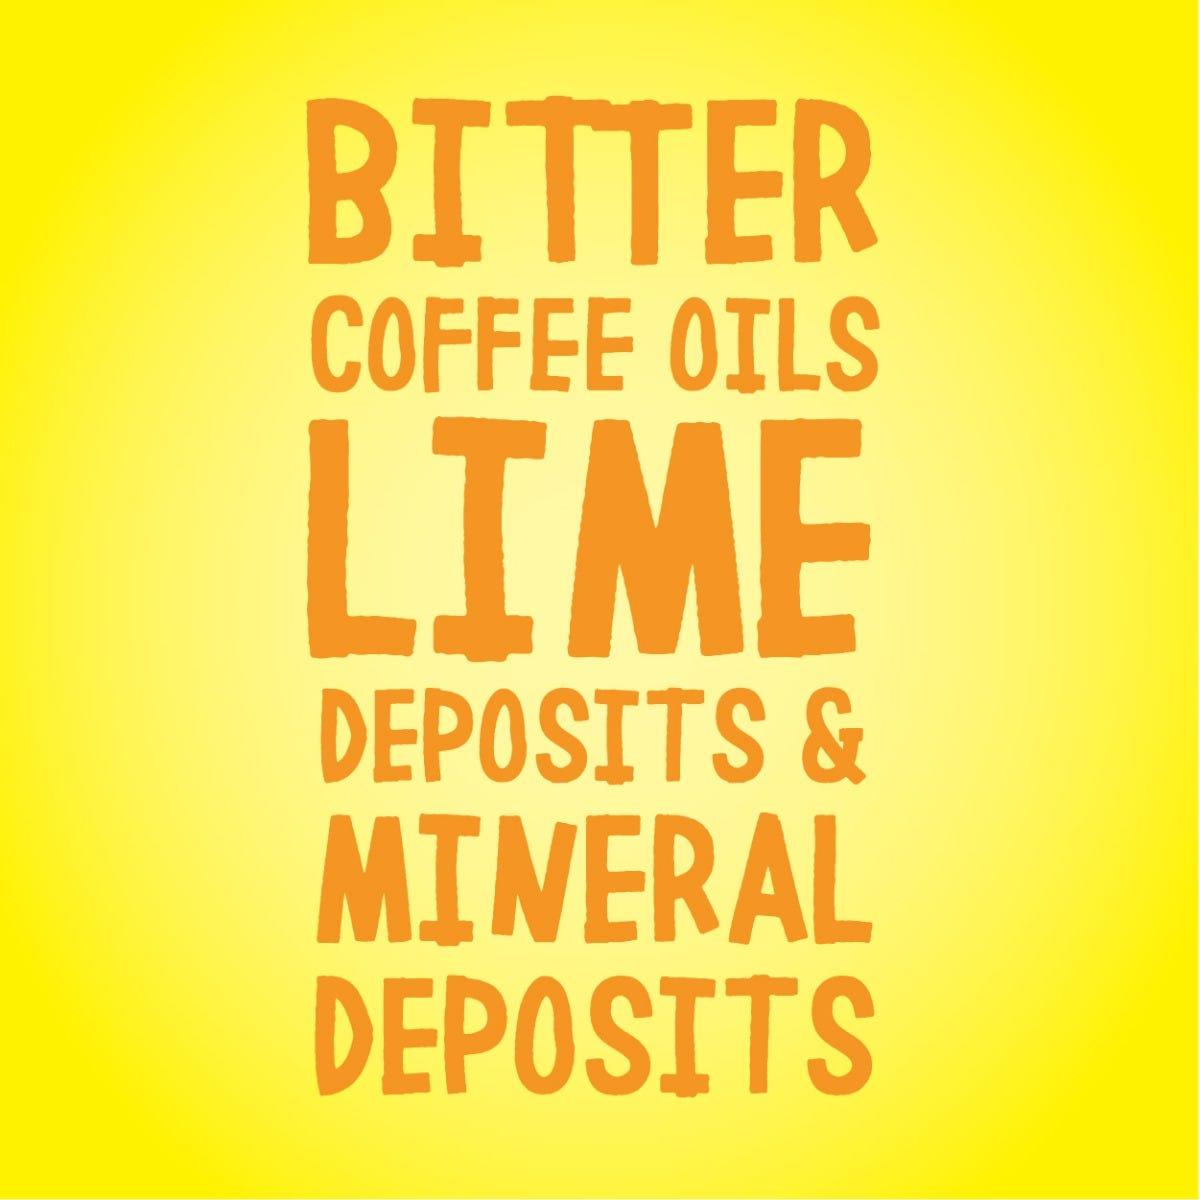 https://googone.com/media/catalog/product/c/o/coffee_maker_cleaner_benefits_1.jpg